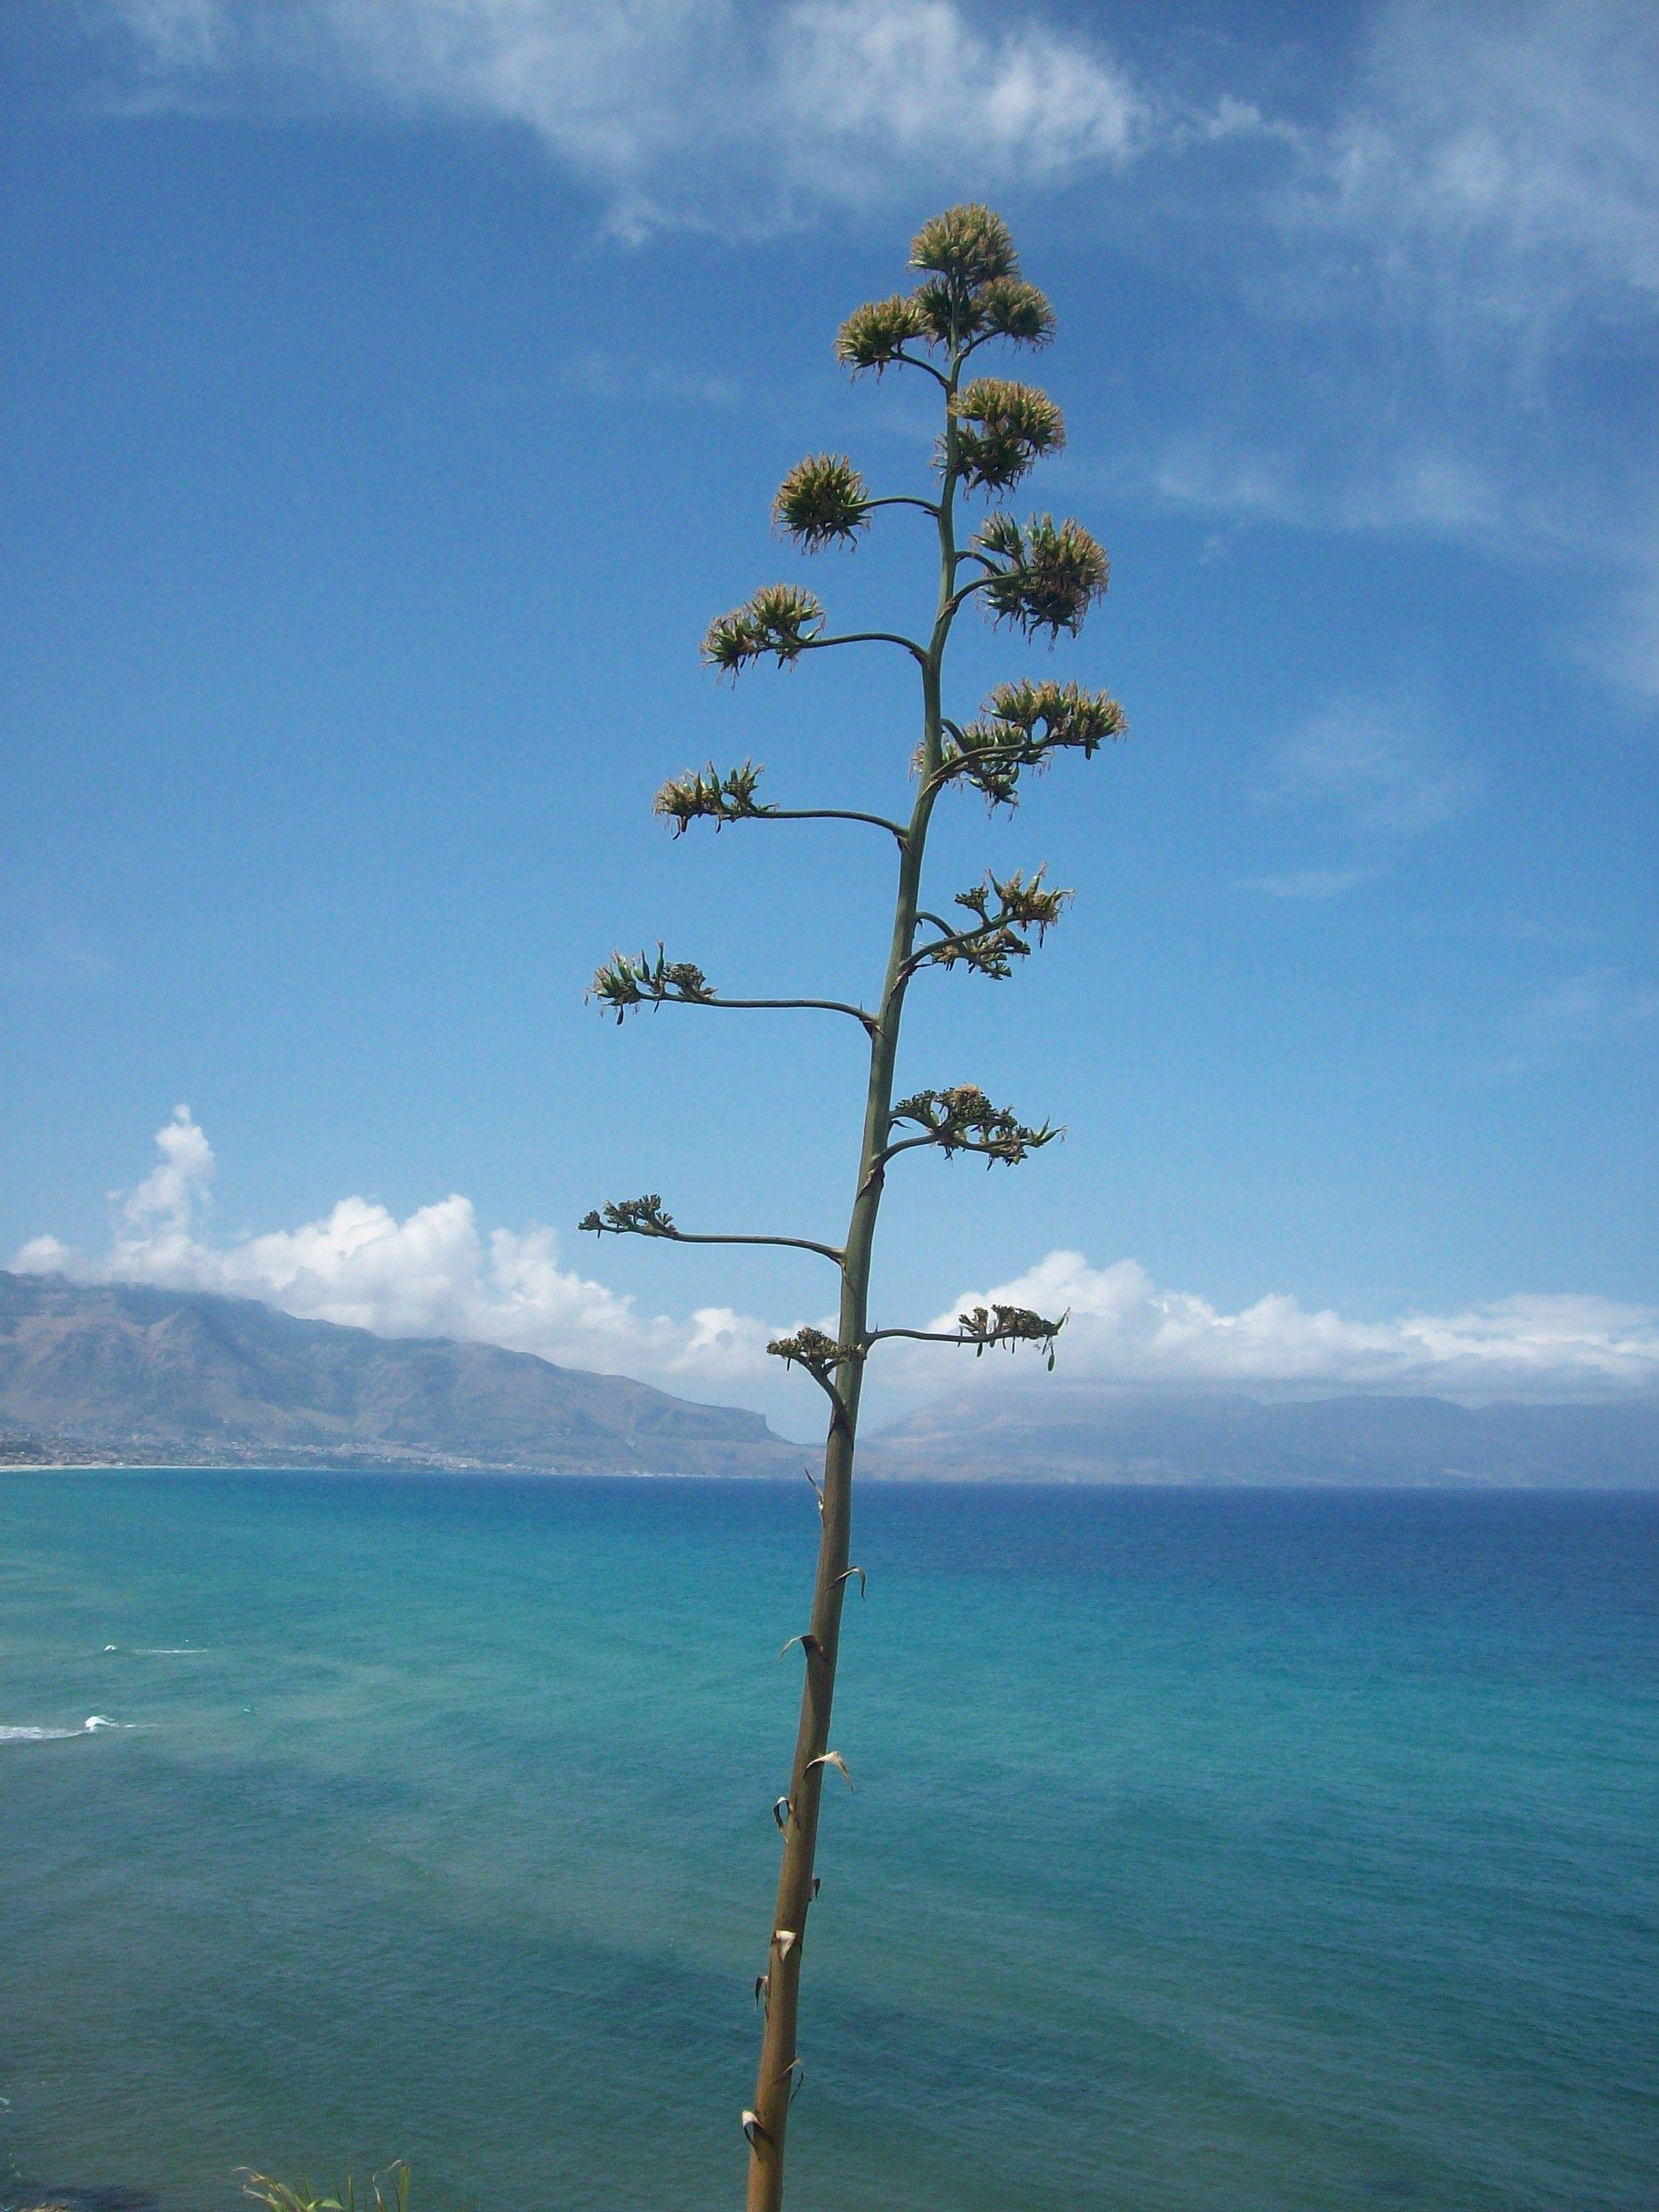 Balestrate Sicily | Wedding venues beach, Most beautiful ...